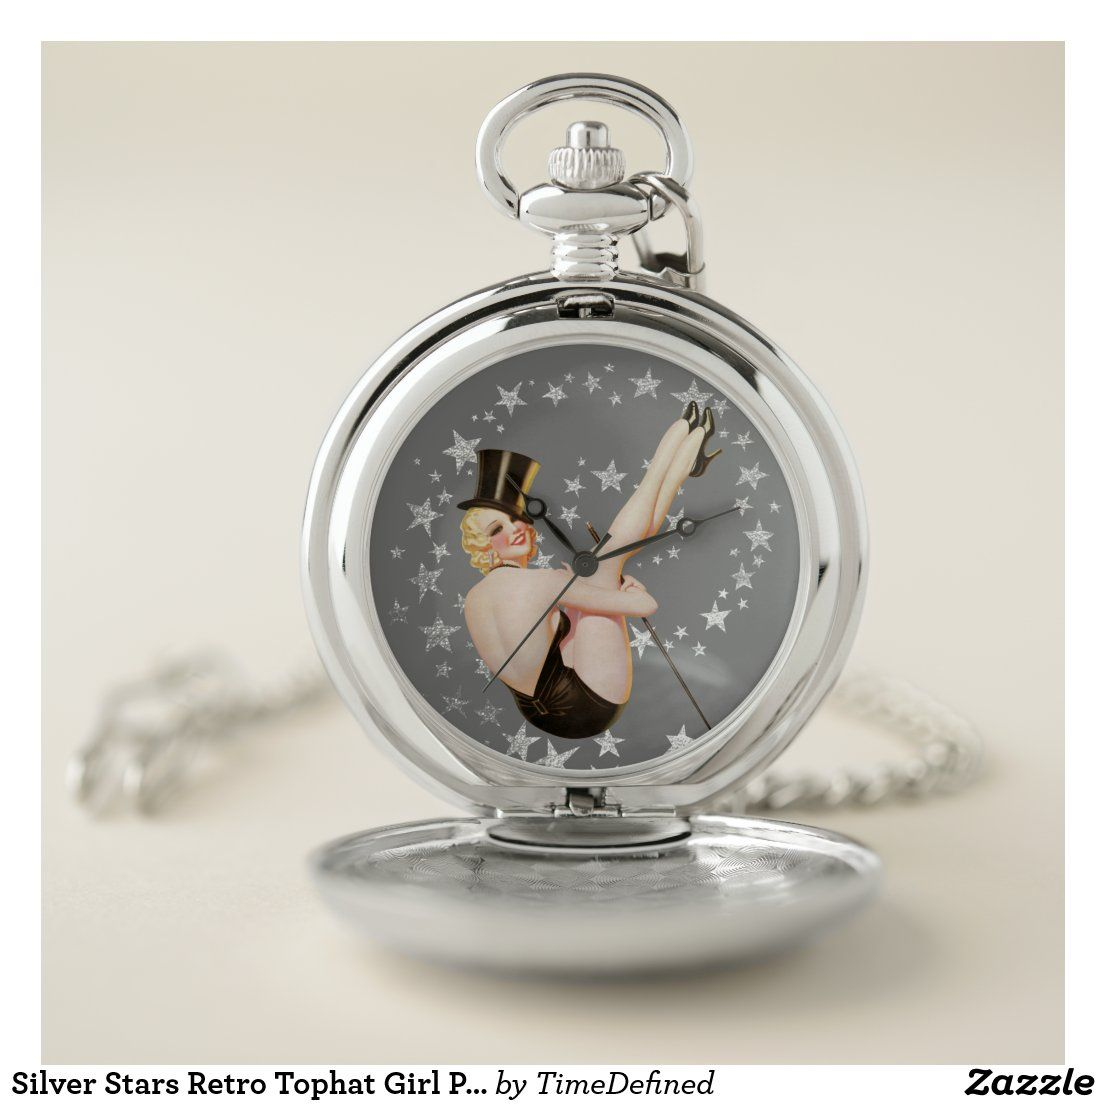 Silver Stars Retro Tophat Girl Pinup Pocket Watch - #pocketwatch #pinup #stars #giftforhim